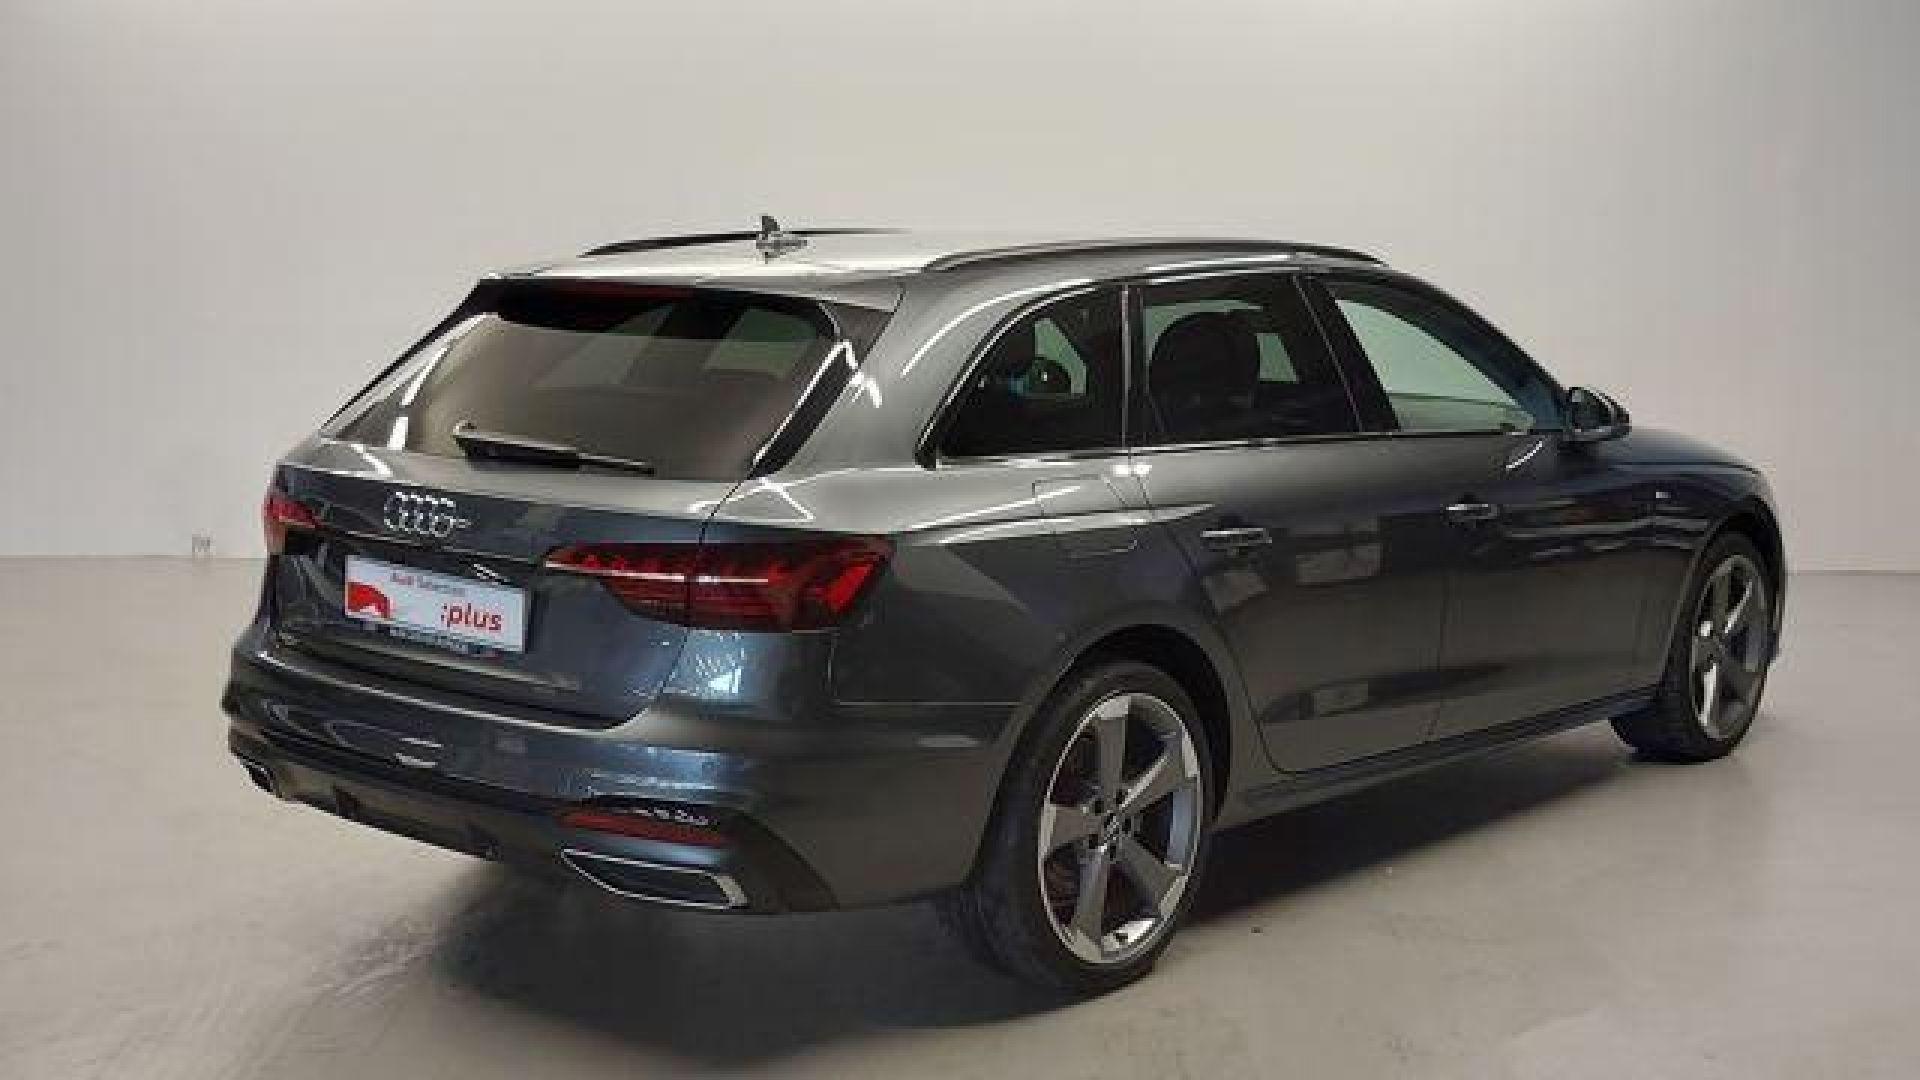 Audi A4 Avant Black line 35 TDI 120kW S tronic